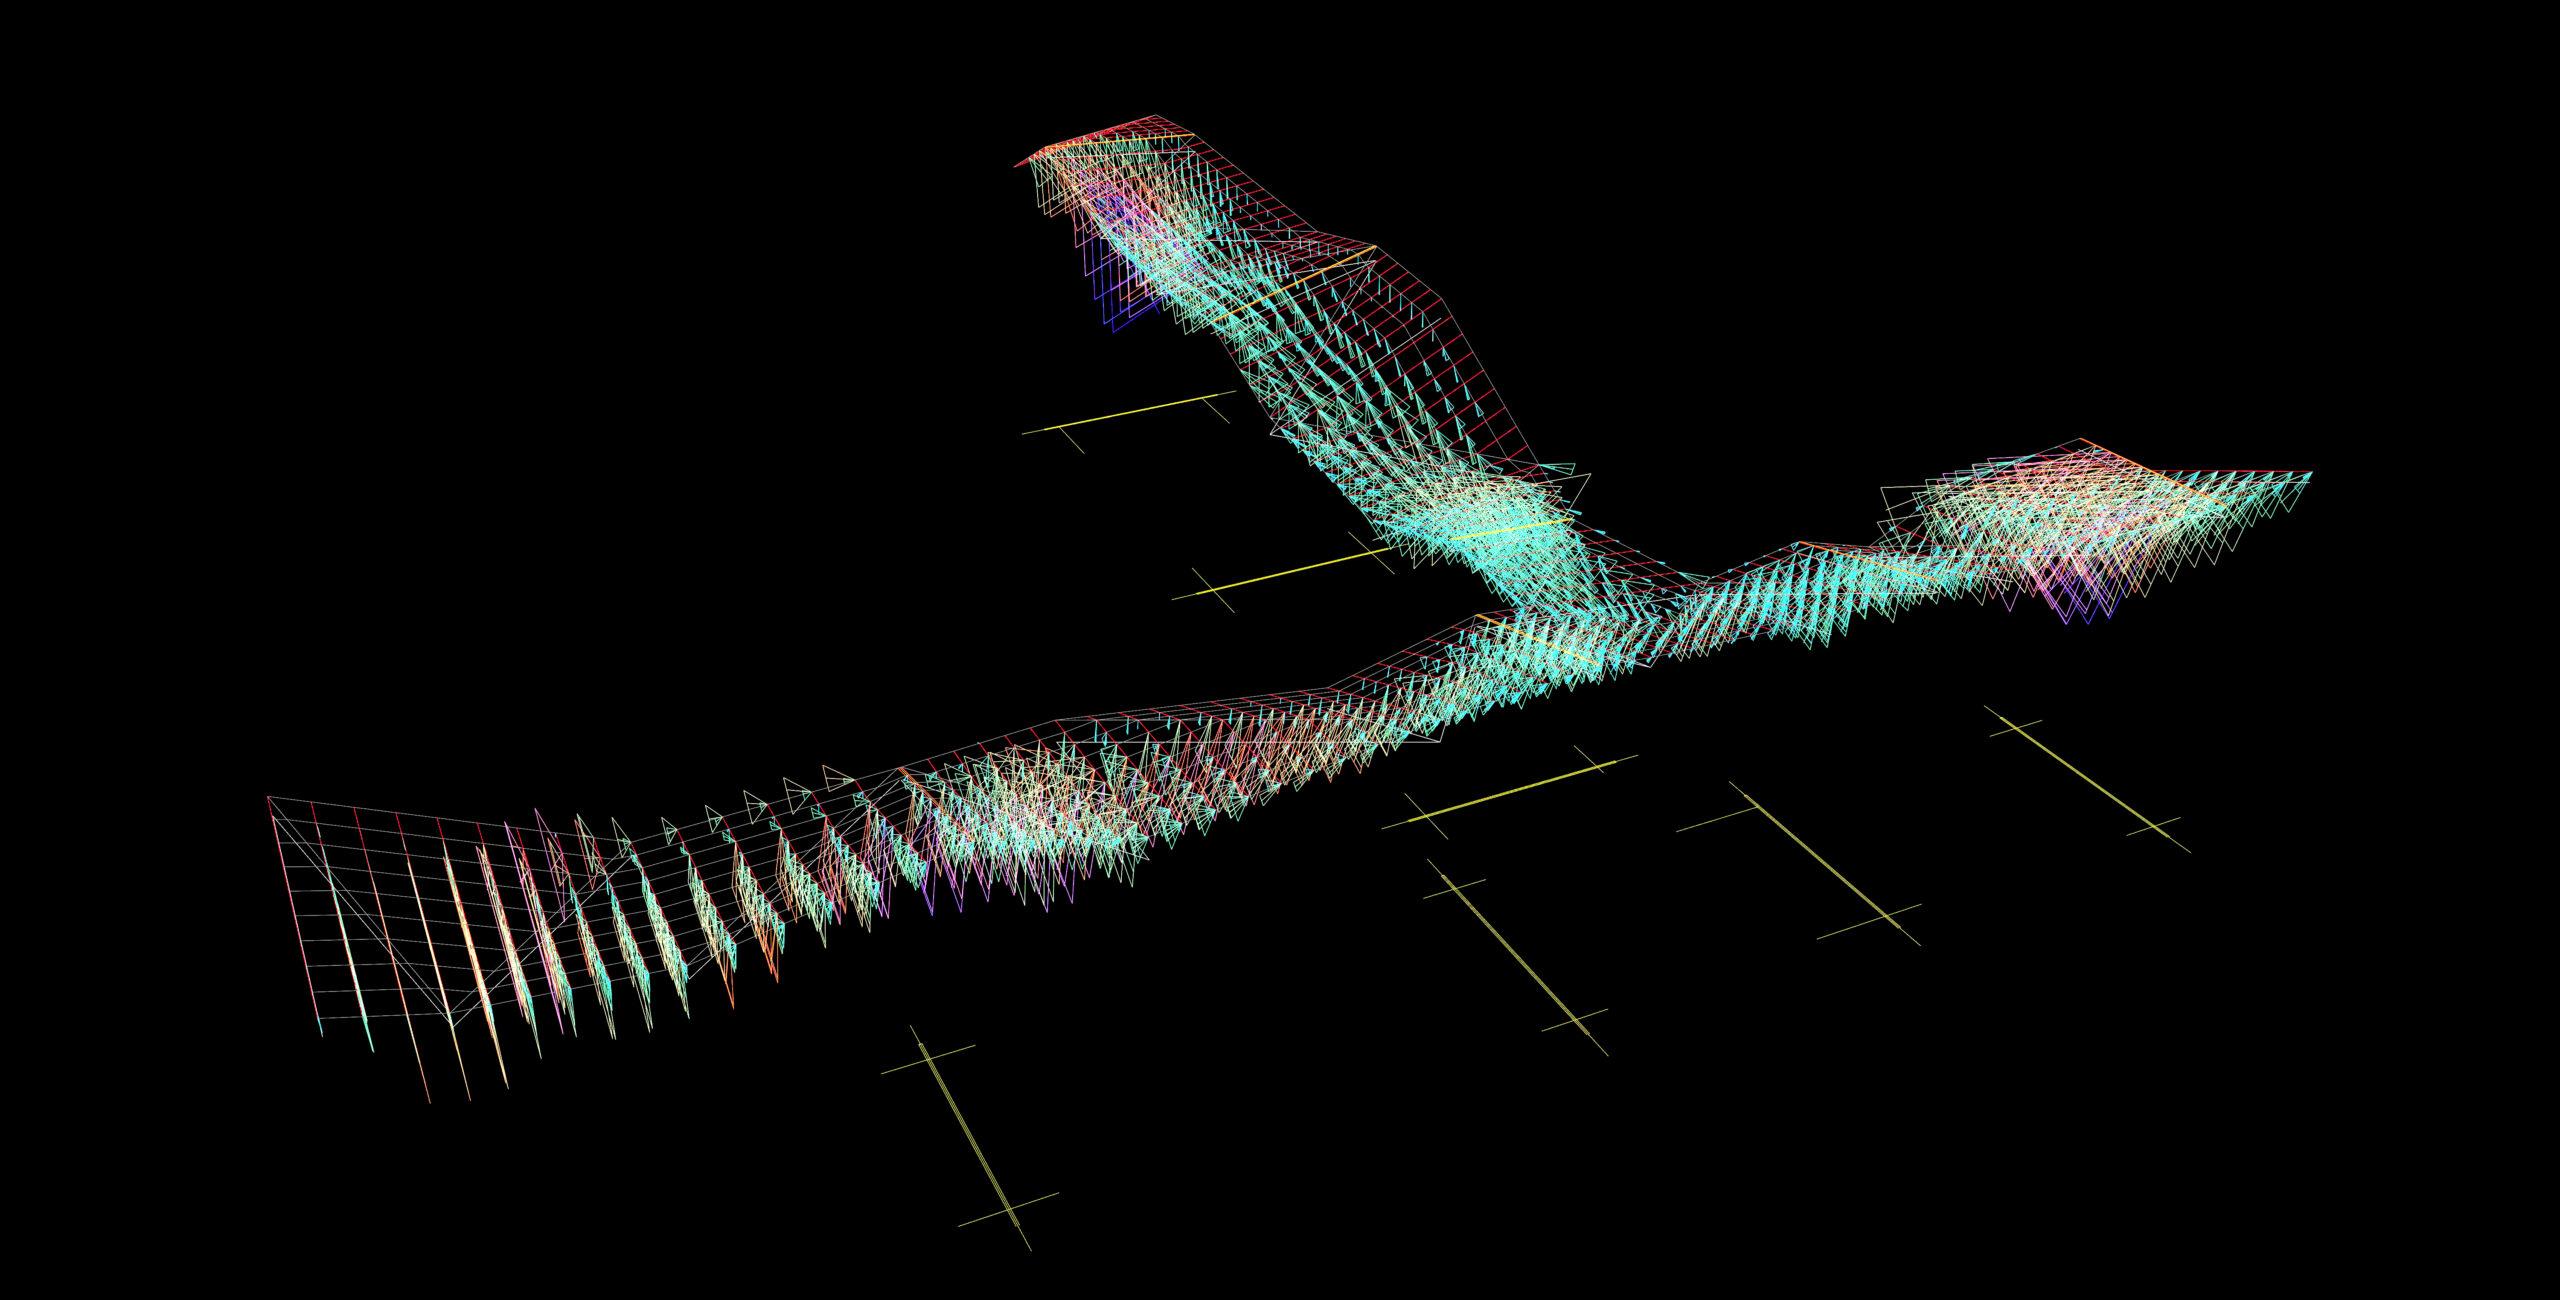 Angular Data of the Blades